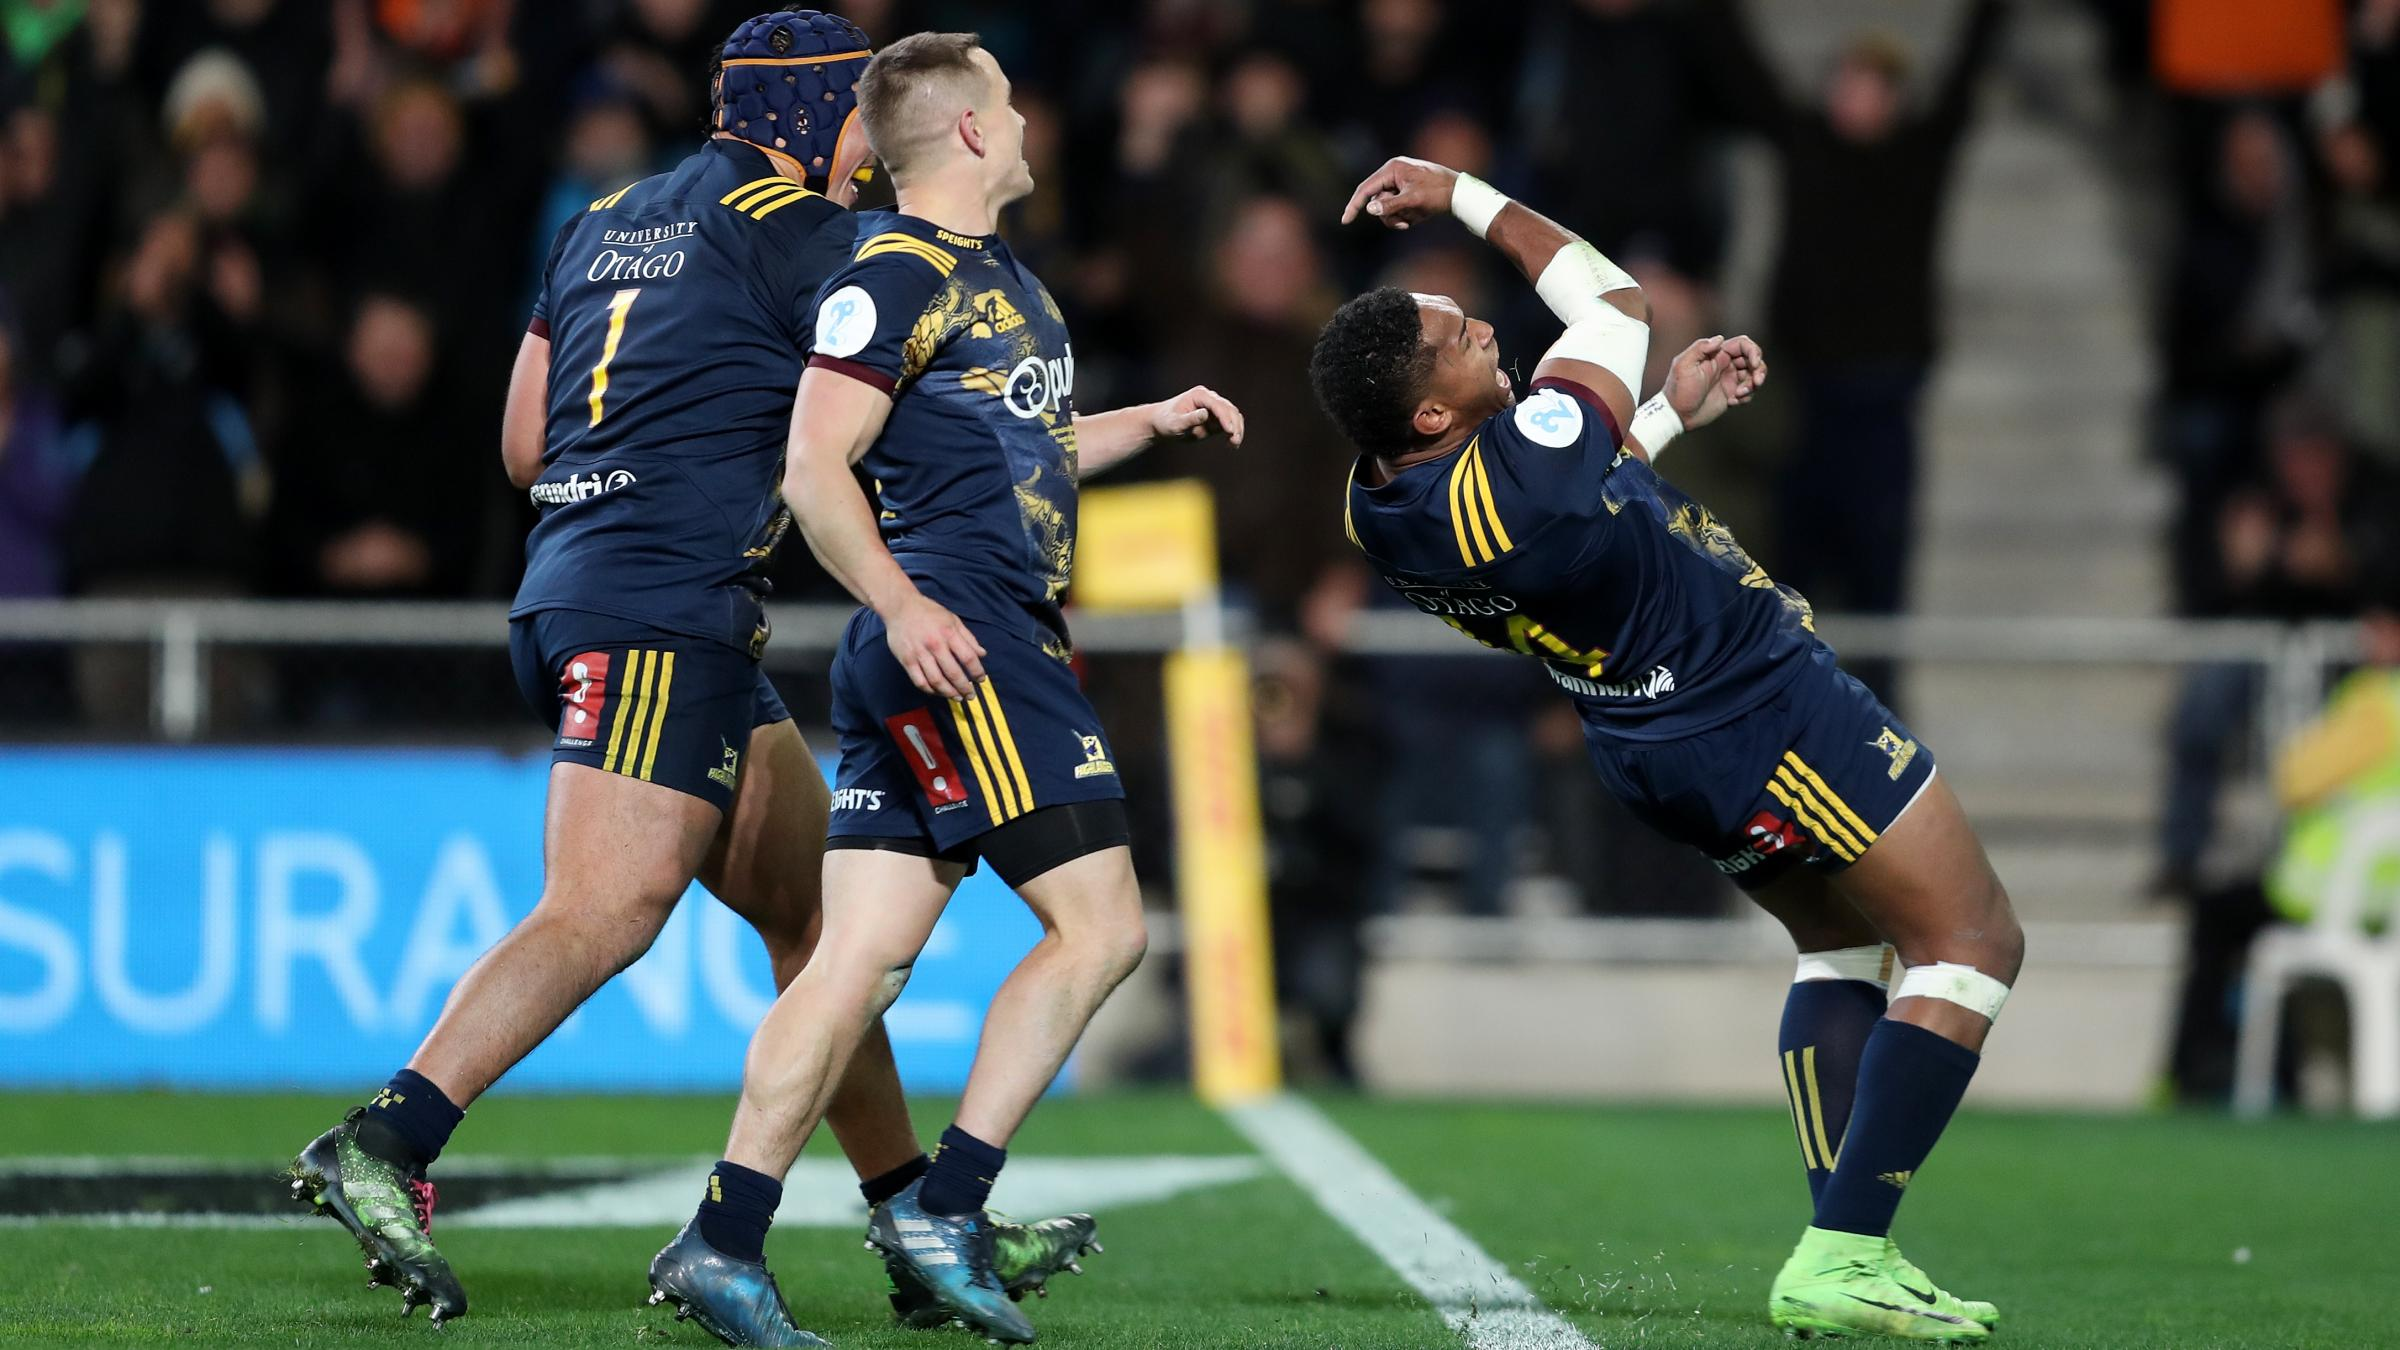 Farrell ruled out of Maoris clash, Sexton starts